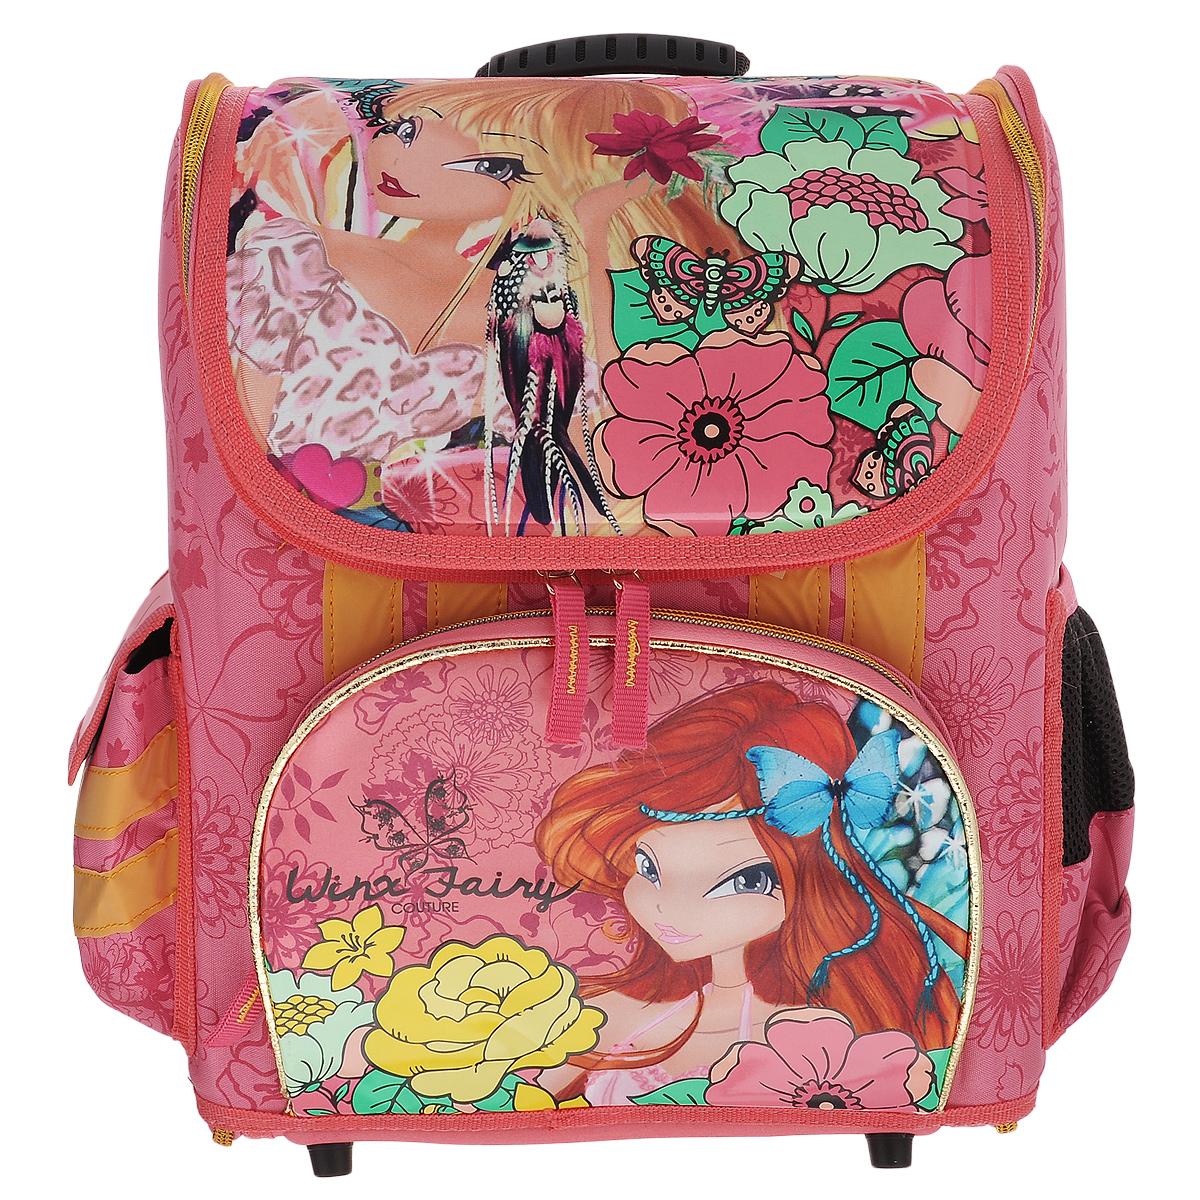 "Winx Club Ранец ""Winx Fairy Couture"", с наполнением, цвет: розовый WXOZ-UT1-116SET"